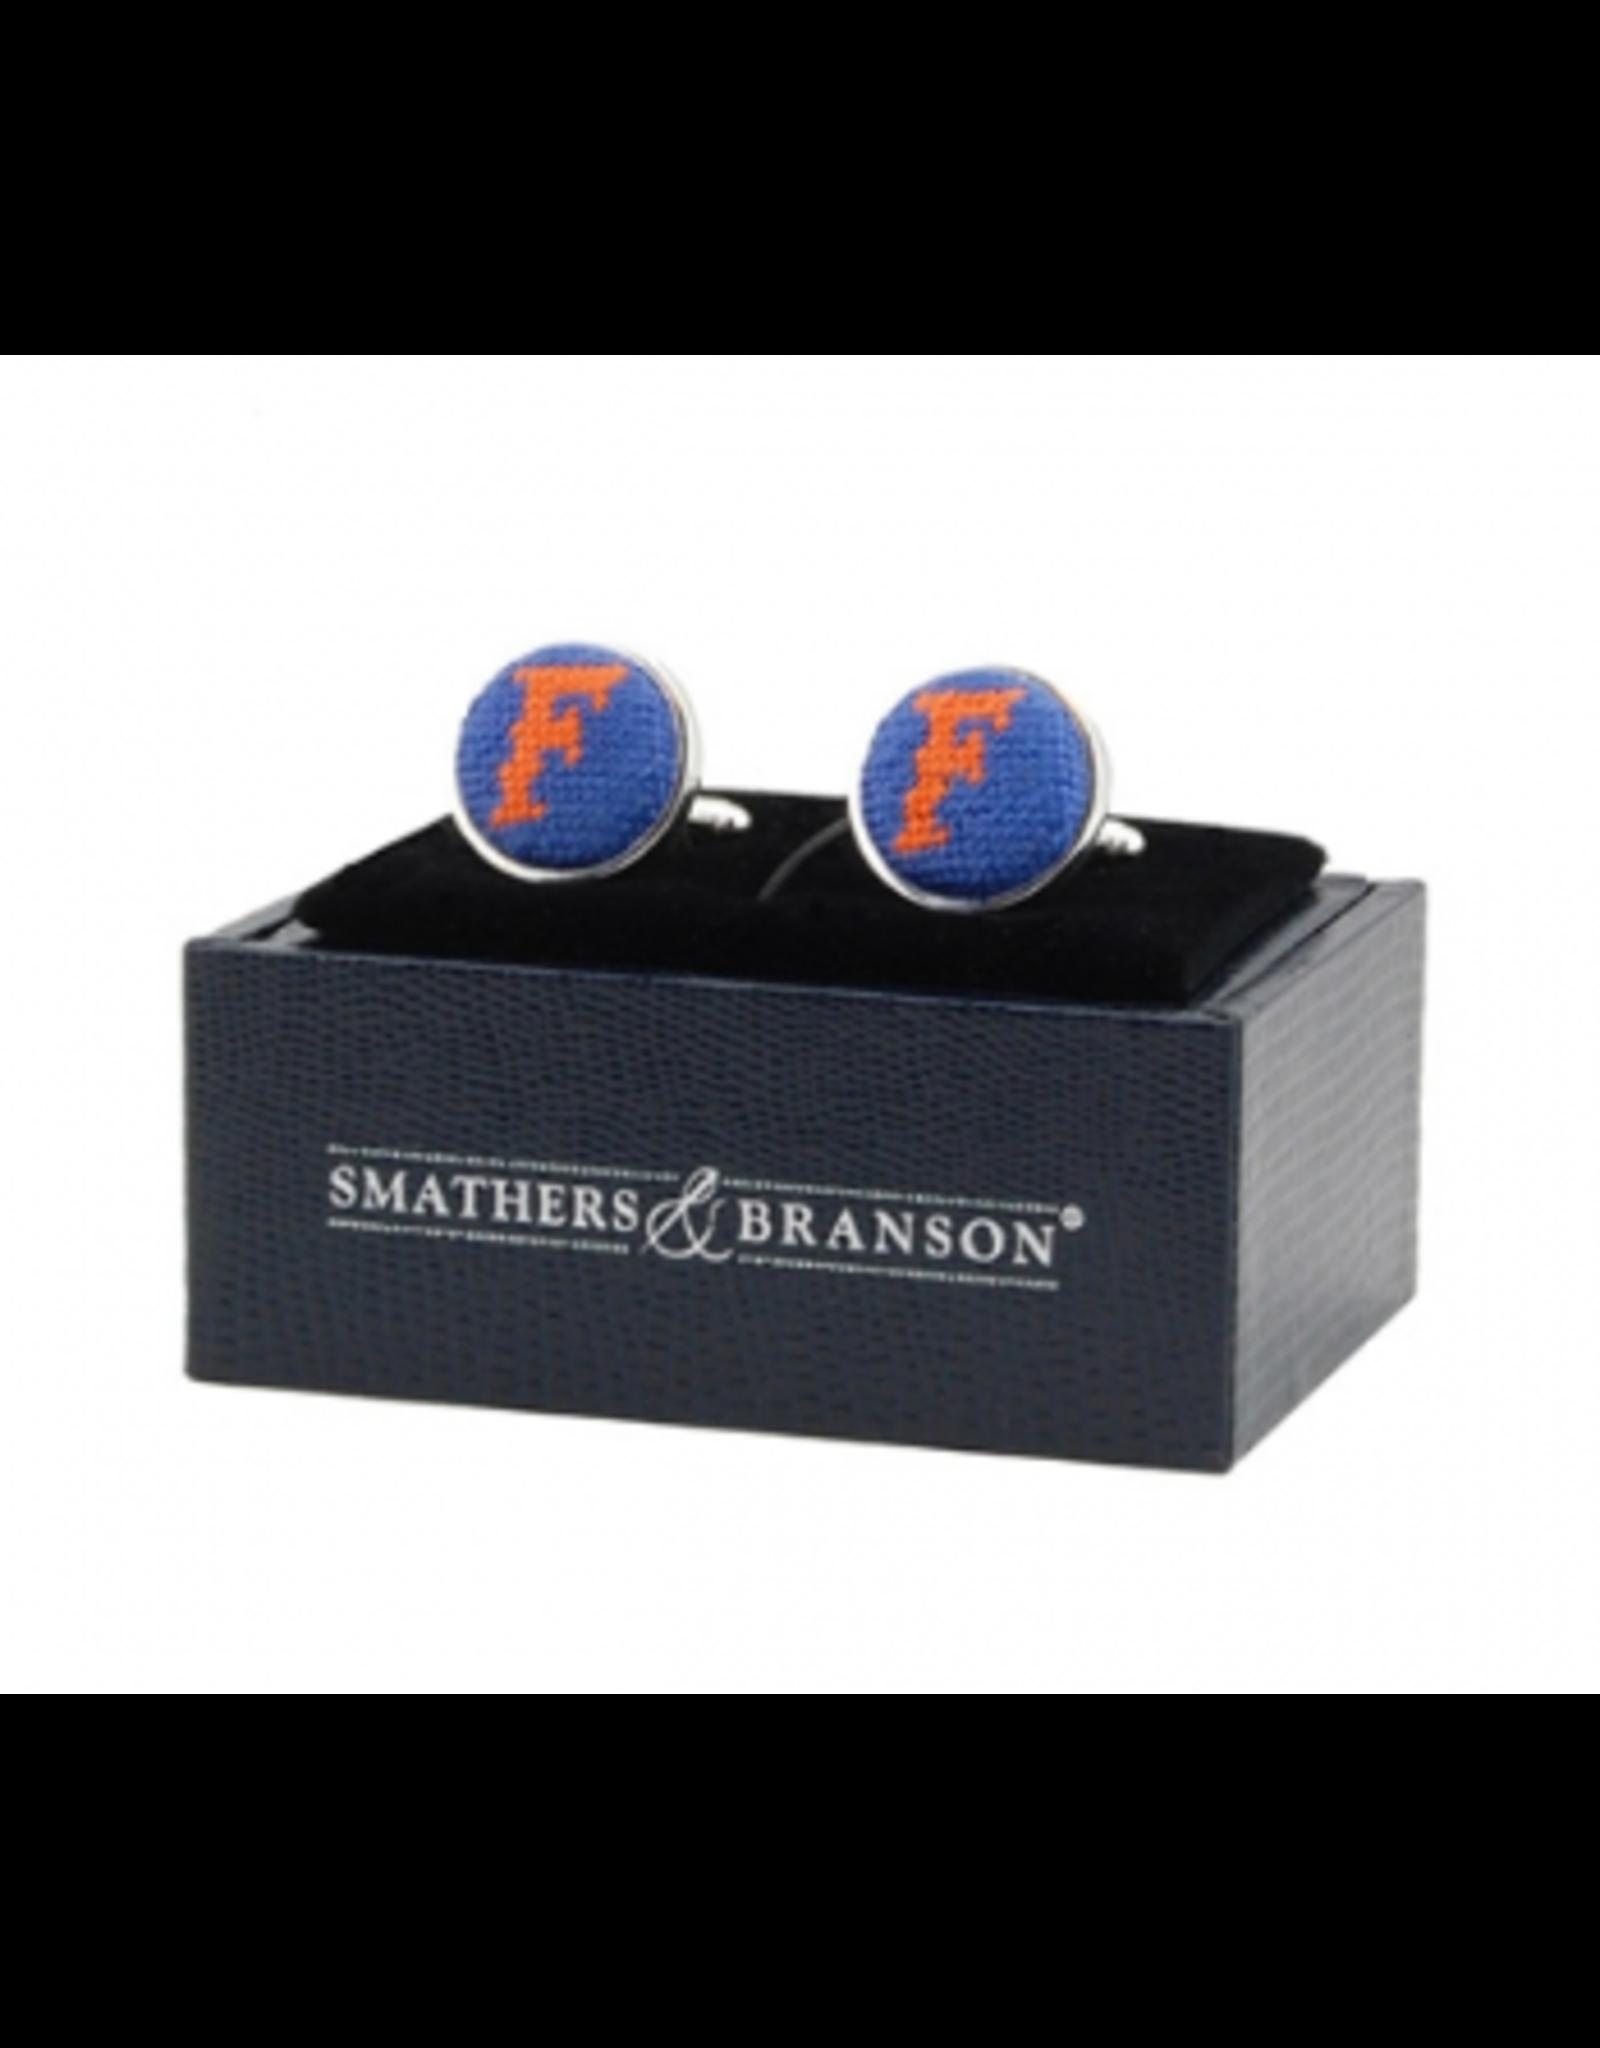 Smathers & Branson Florida Cuff Links